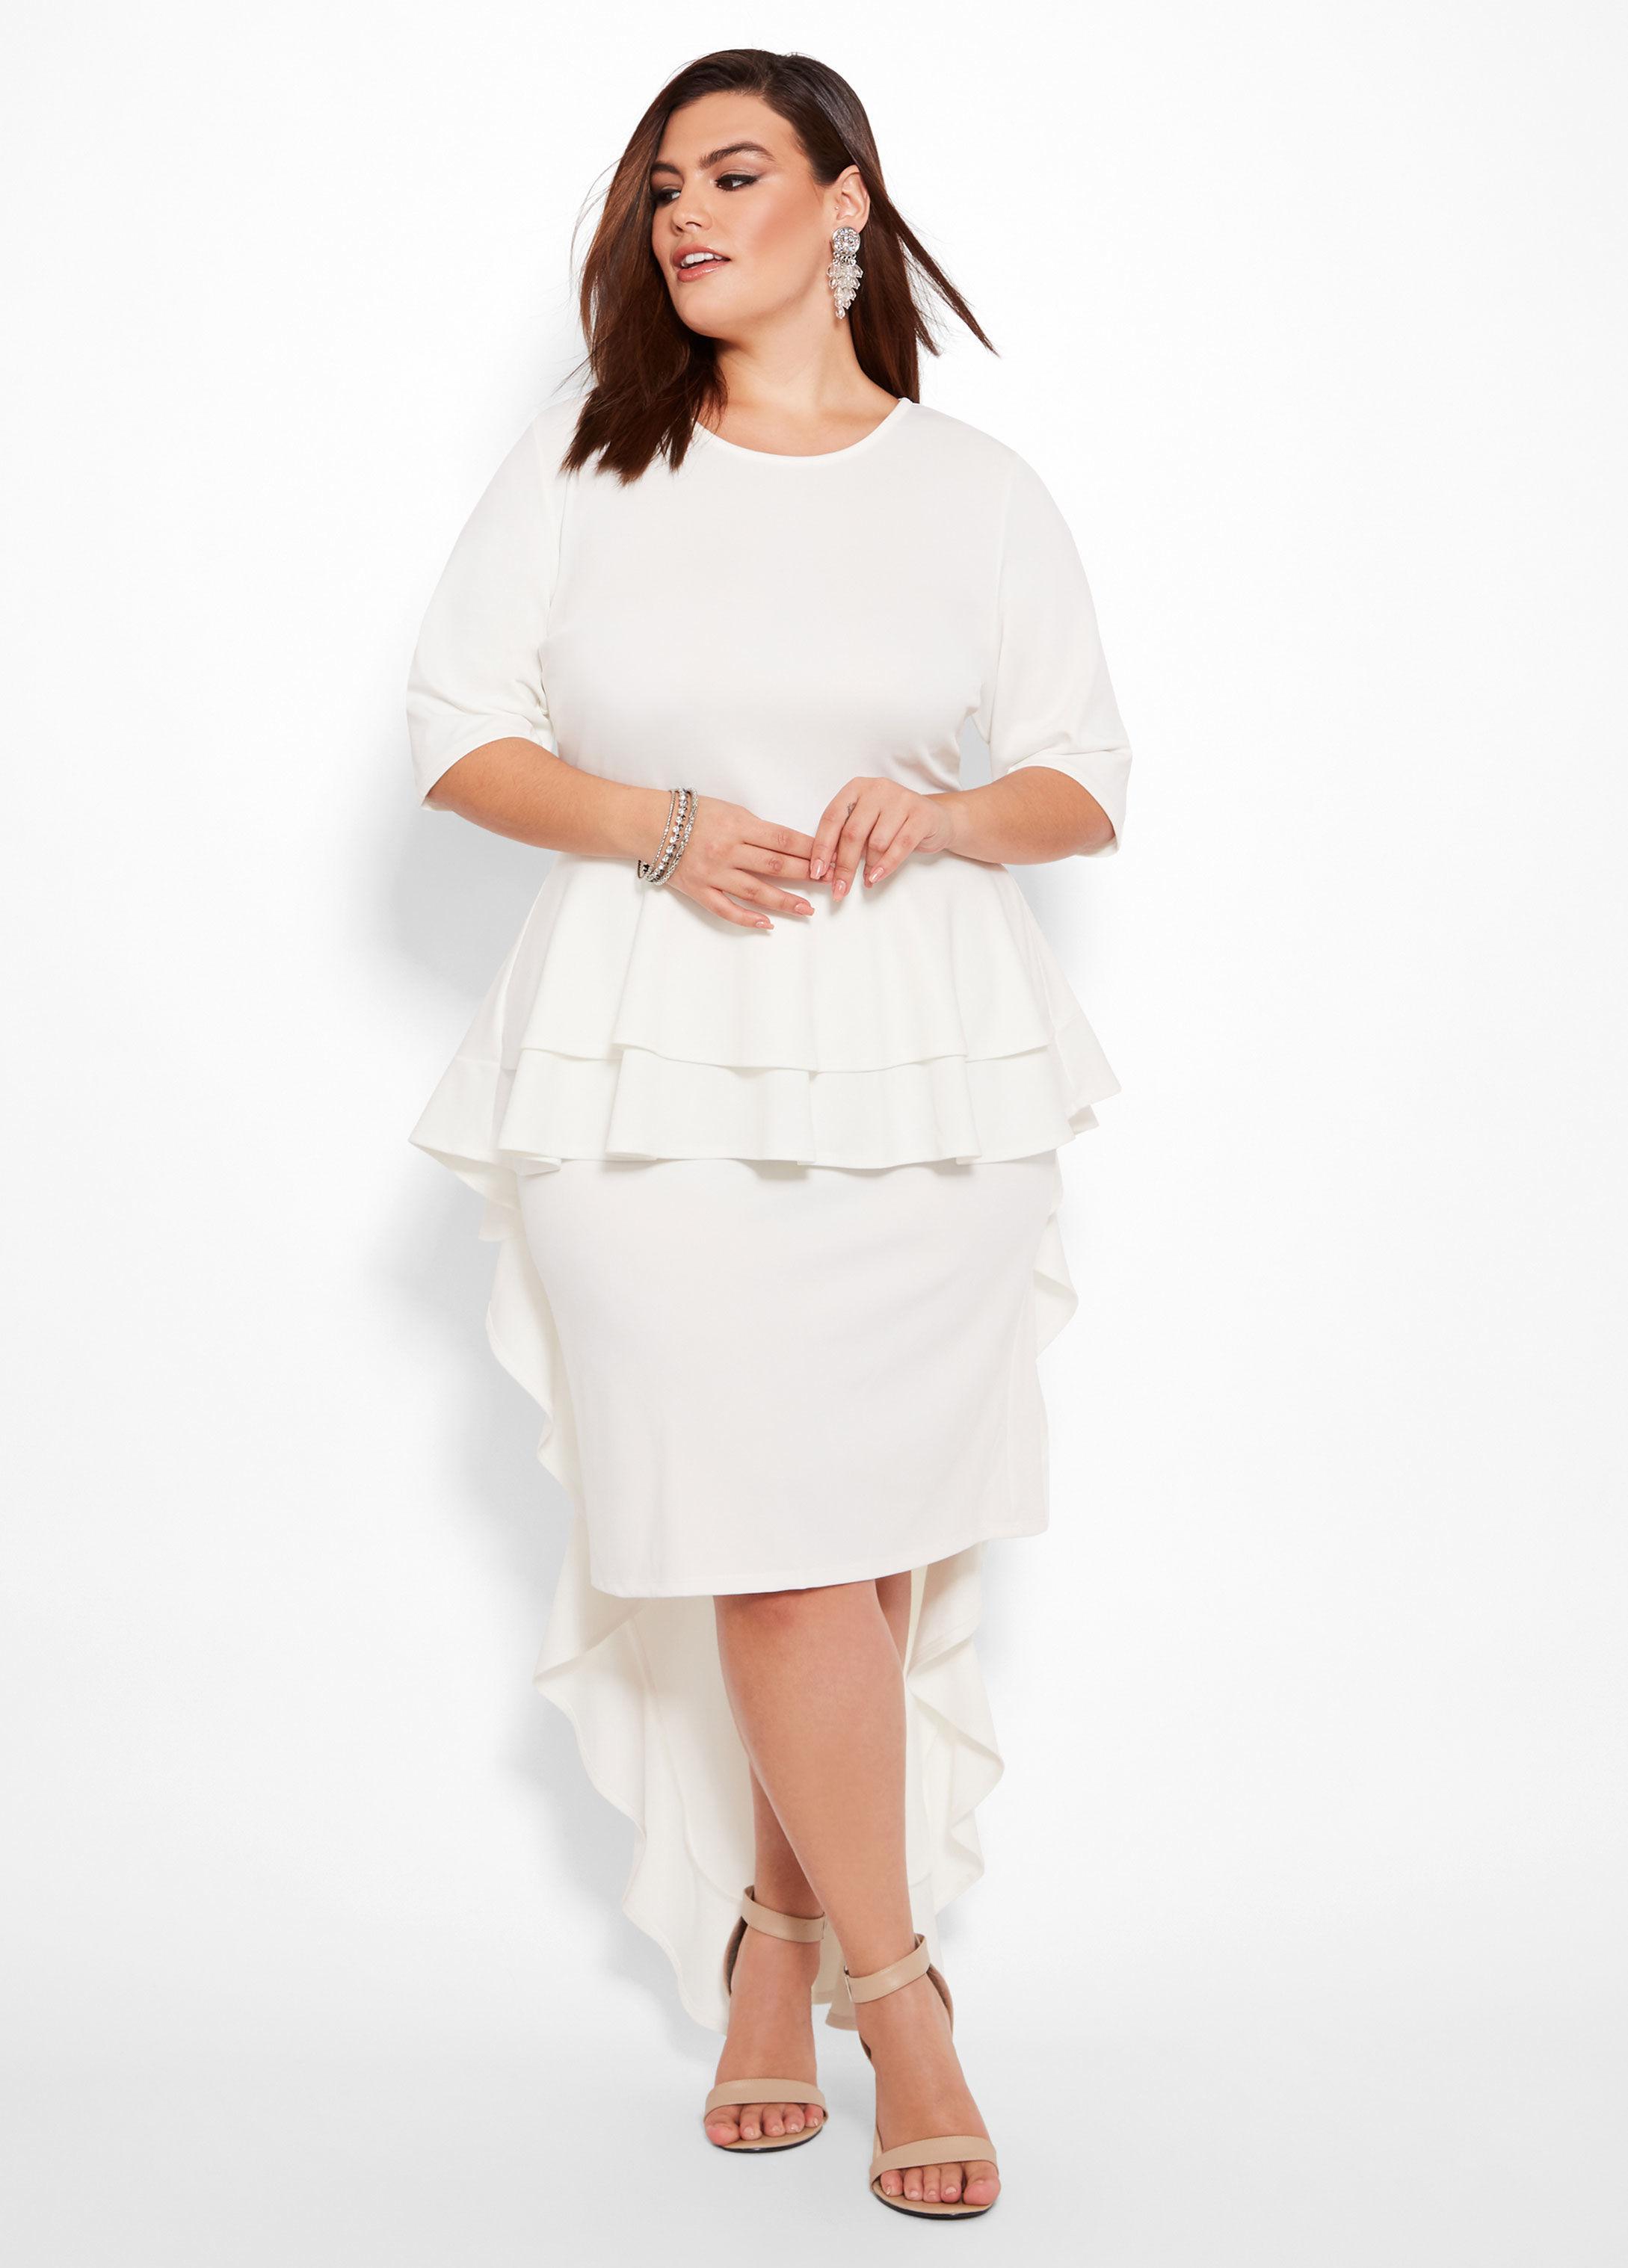 6a87c6cc38b7a Lyst - Ashley Stewart Plus Size Peplum Dress With Train in White